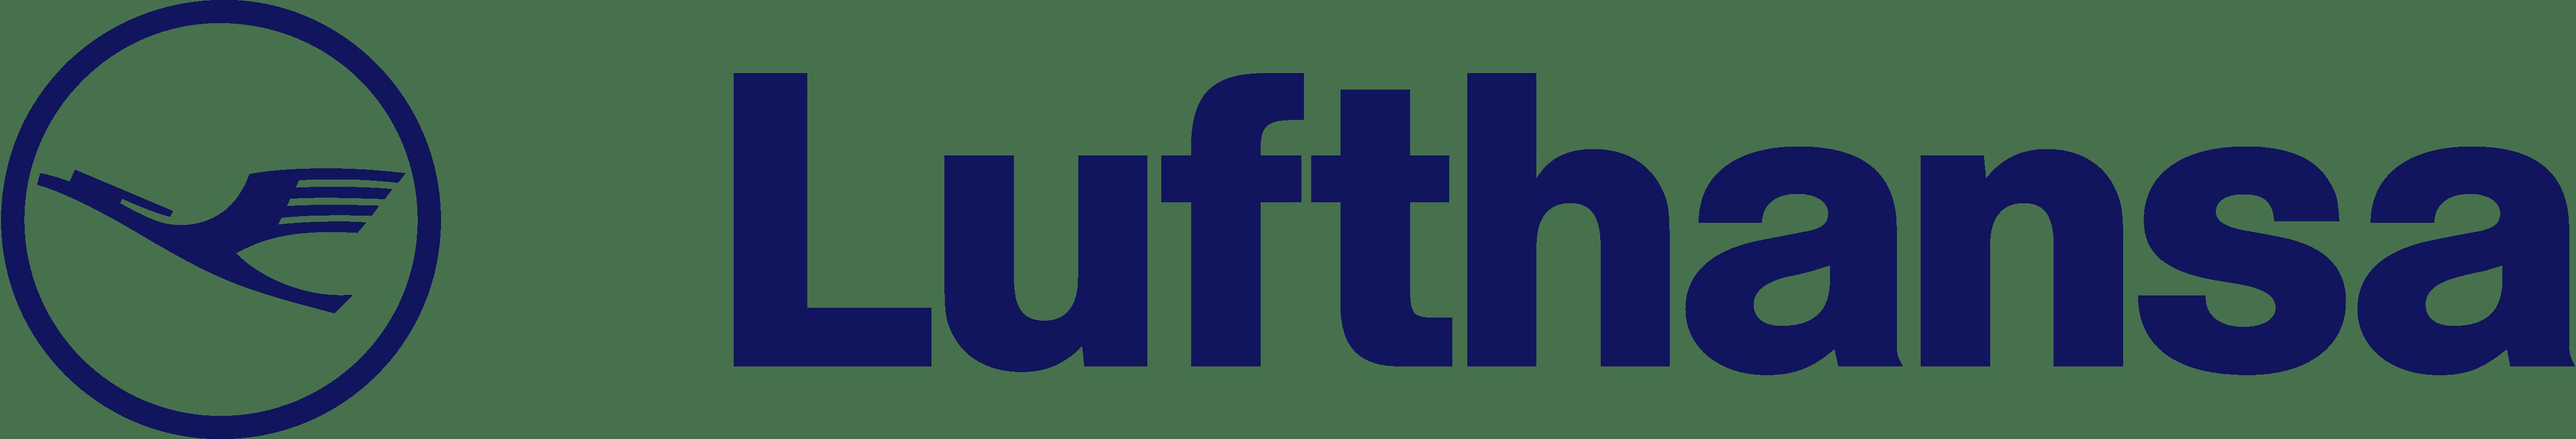 Resultado de imagen para lufthansa new logo